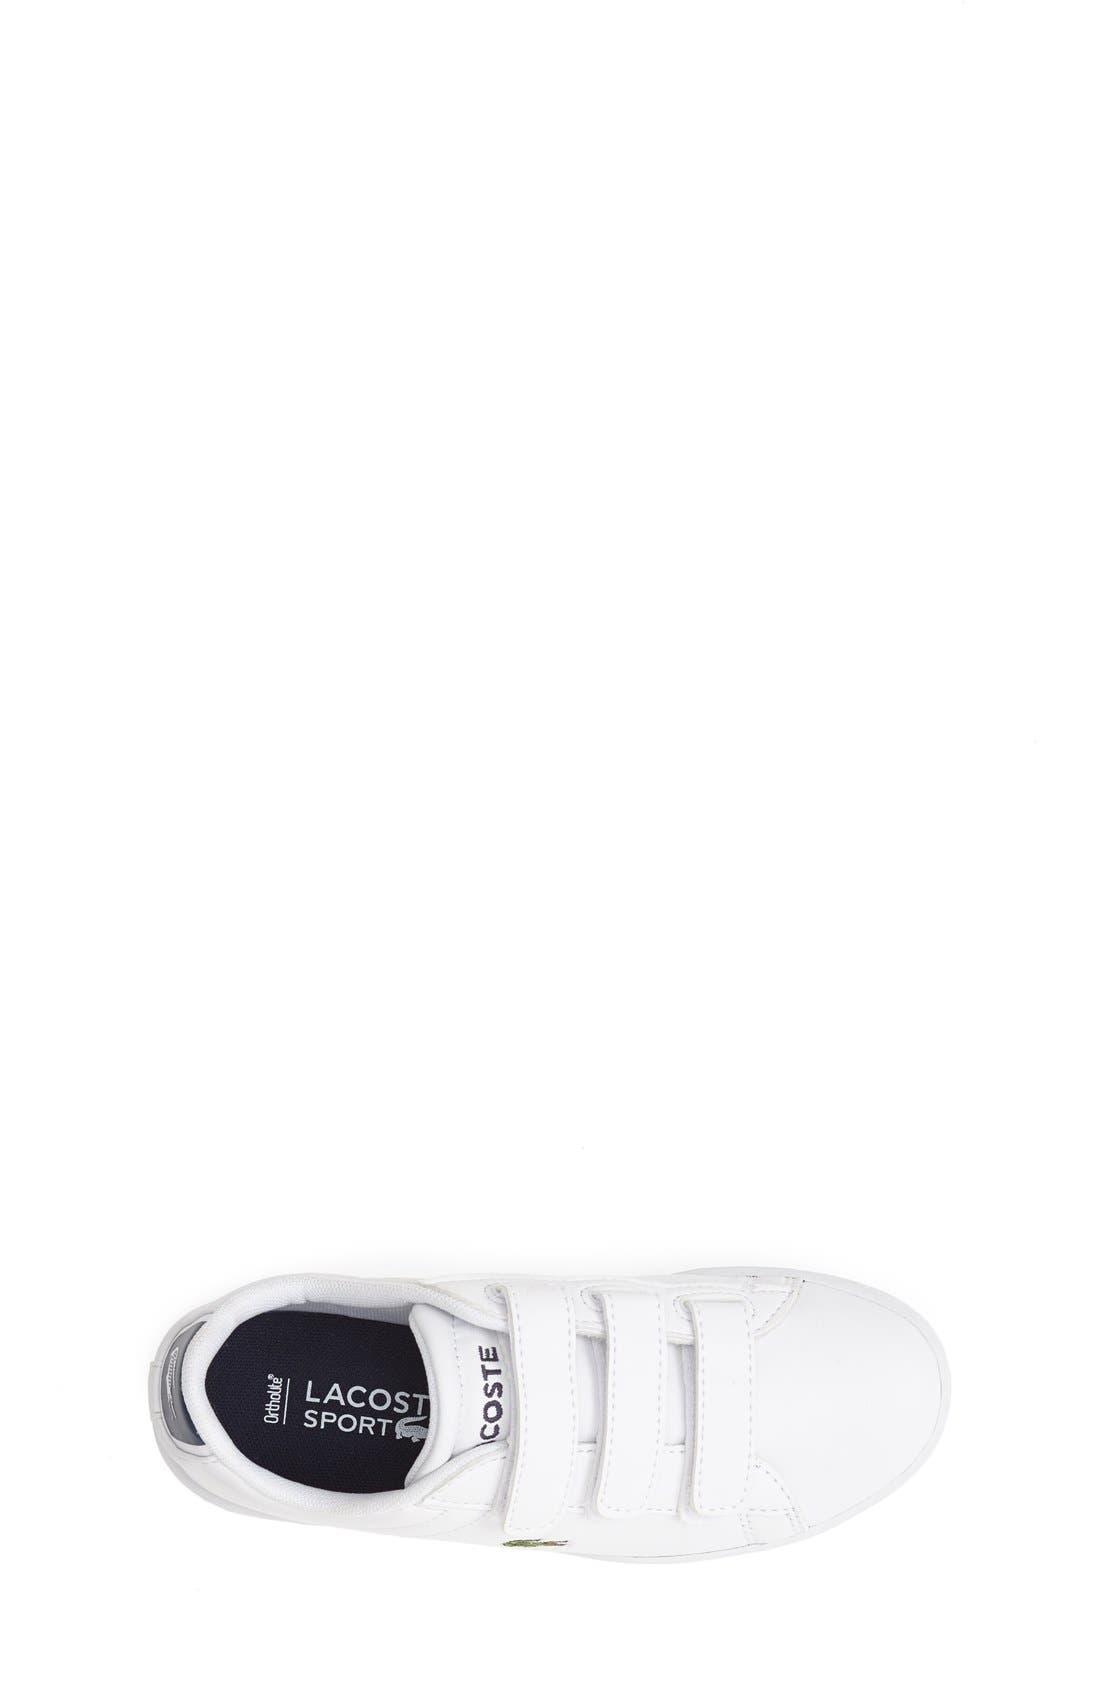 Alternate Image 3  - Lacoste 'Carnaby' Sneaker (Toddler & Little Kid)